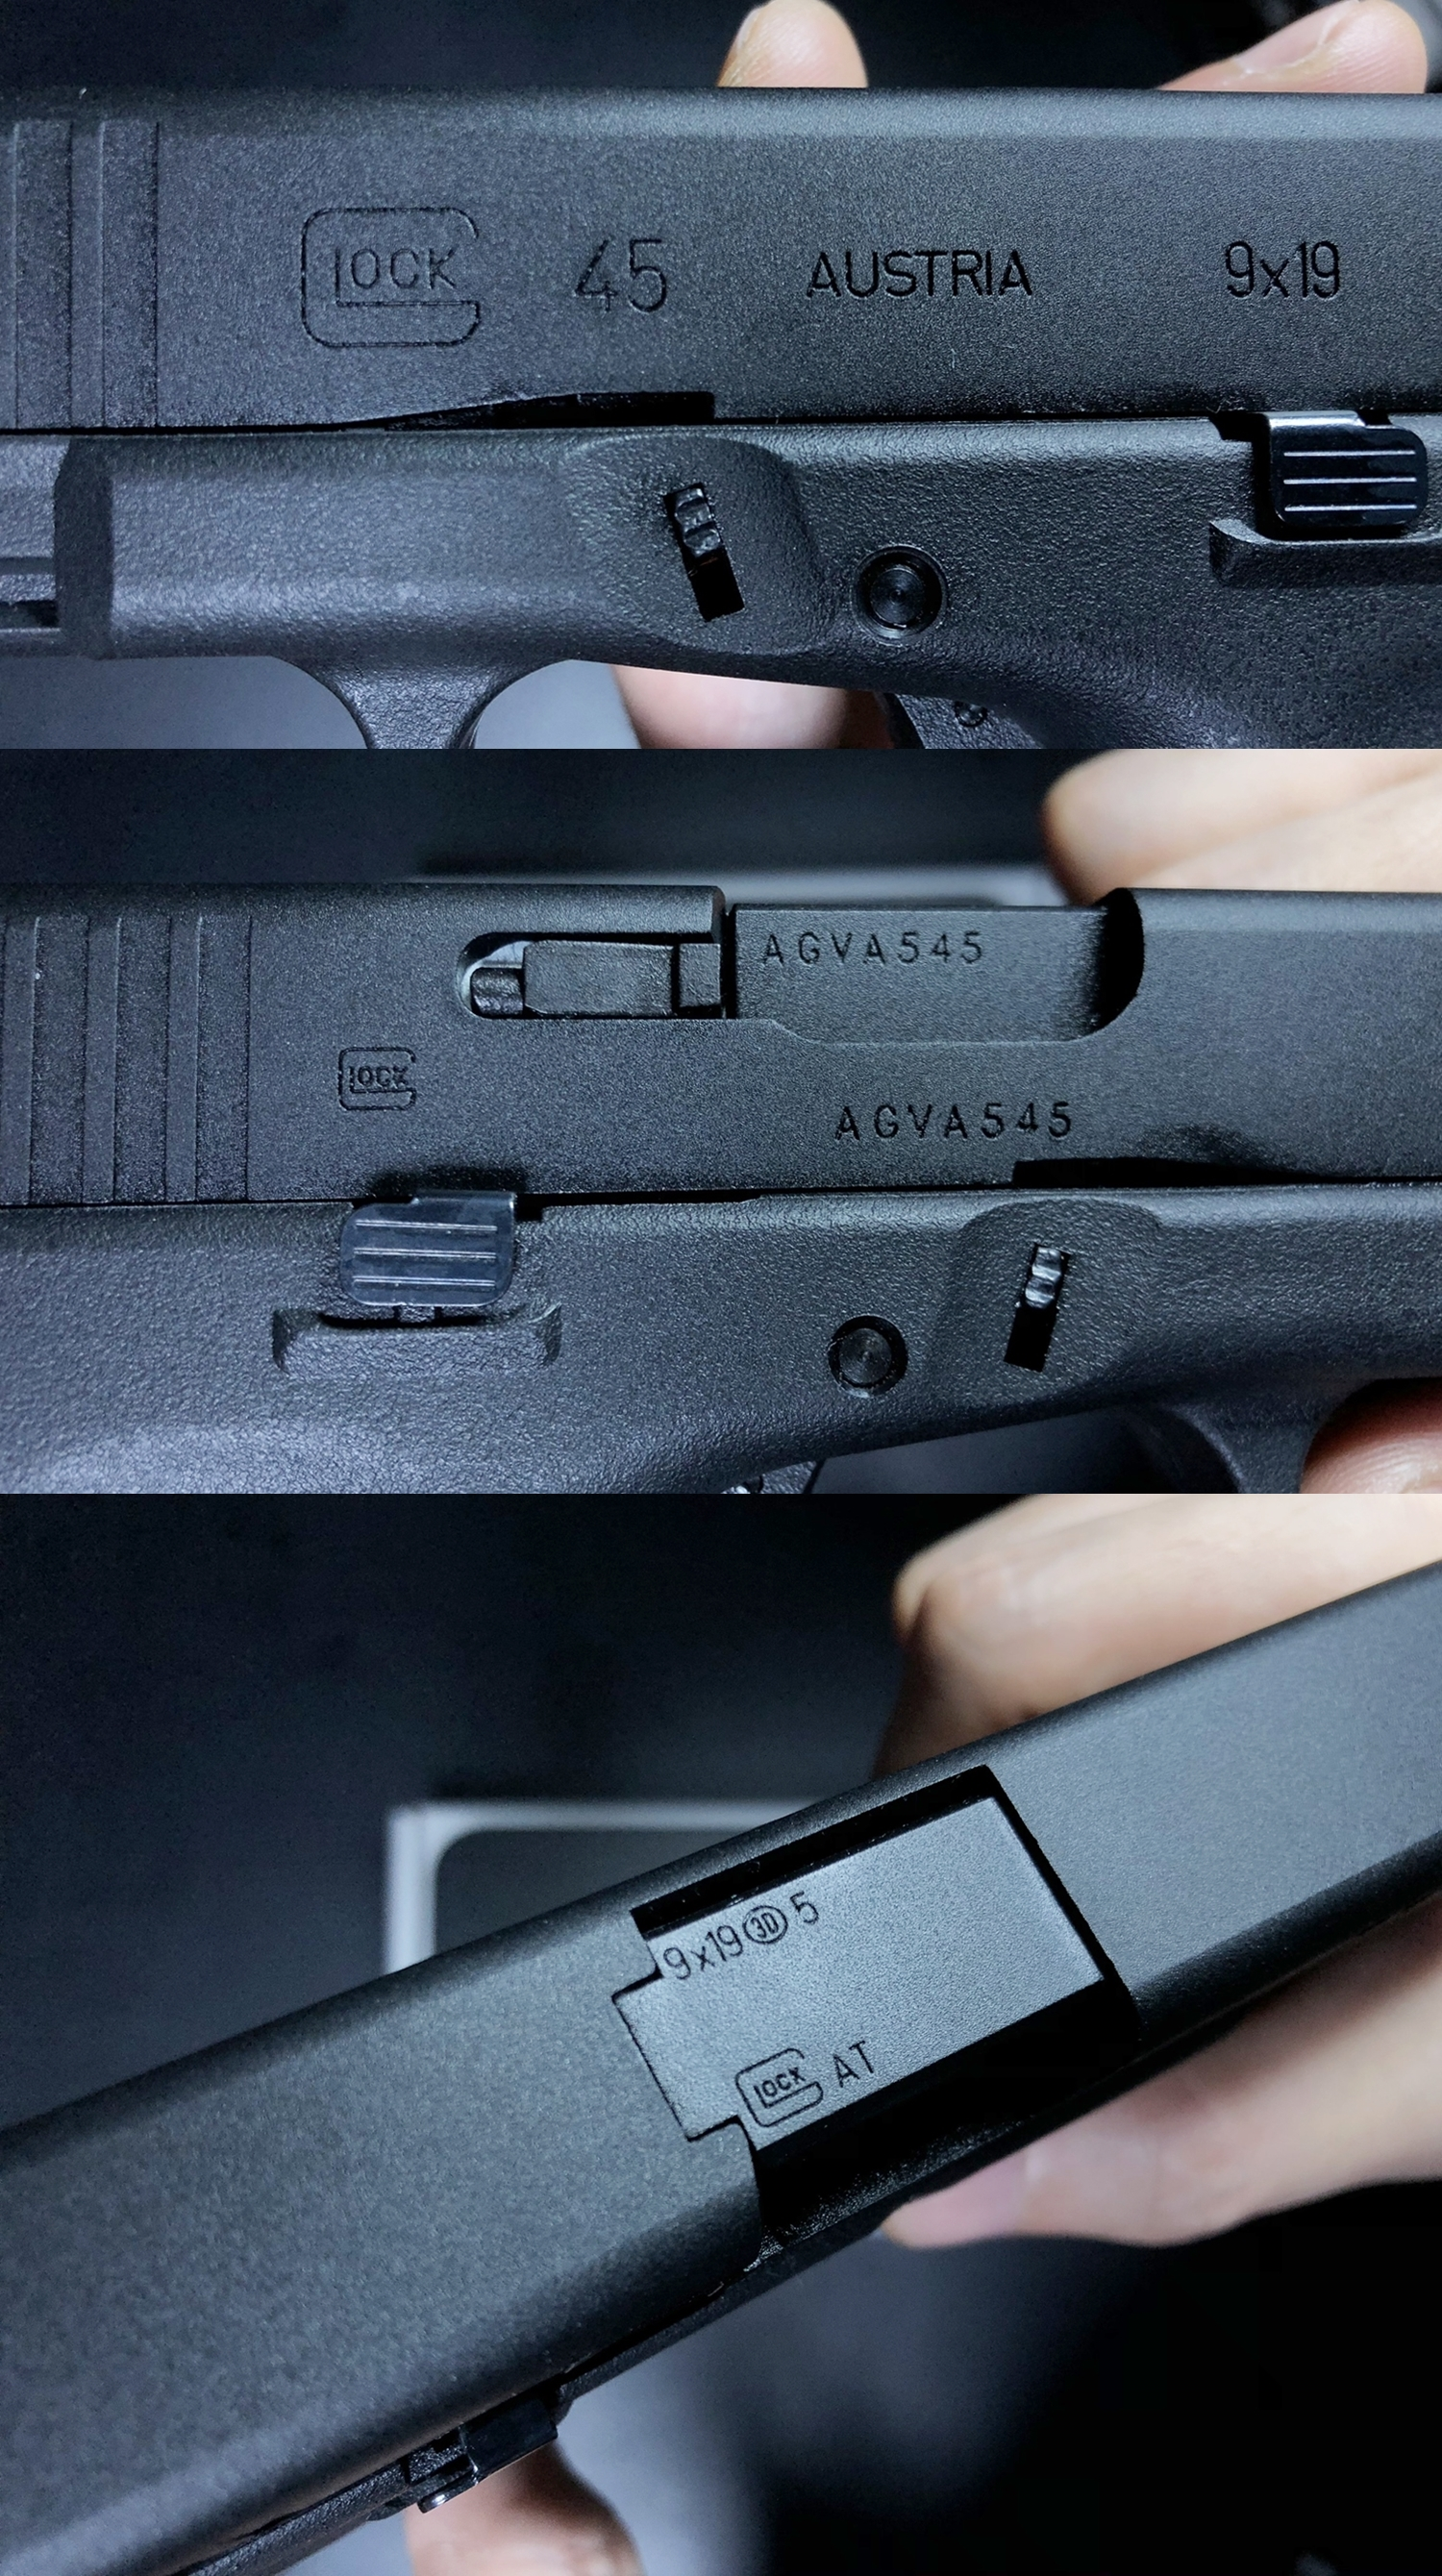 7 UMAREX VFC GLOCK G45 GBB AIRSOFT!! 噂のウマレックス G45 グロック ガスブローバック!! やっと我が家へ着弾 ~ 新品箱出し編!! 購入 開封 初速 計測 検証 比較 通常分解 組立 カスタム レビュー!!